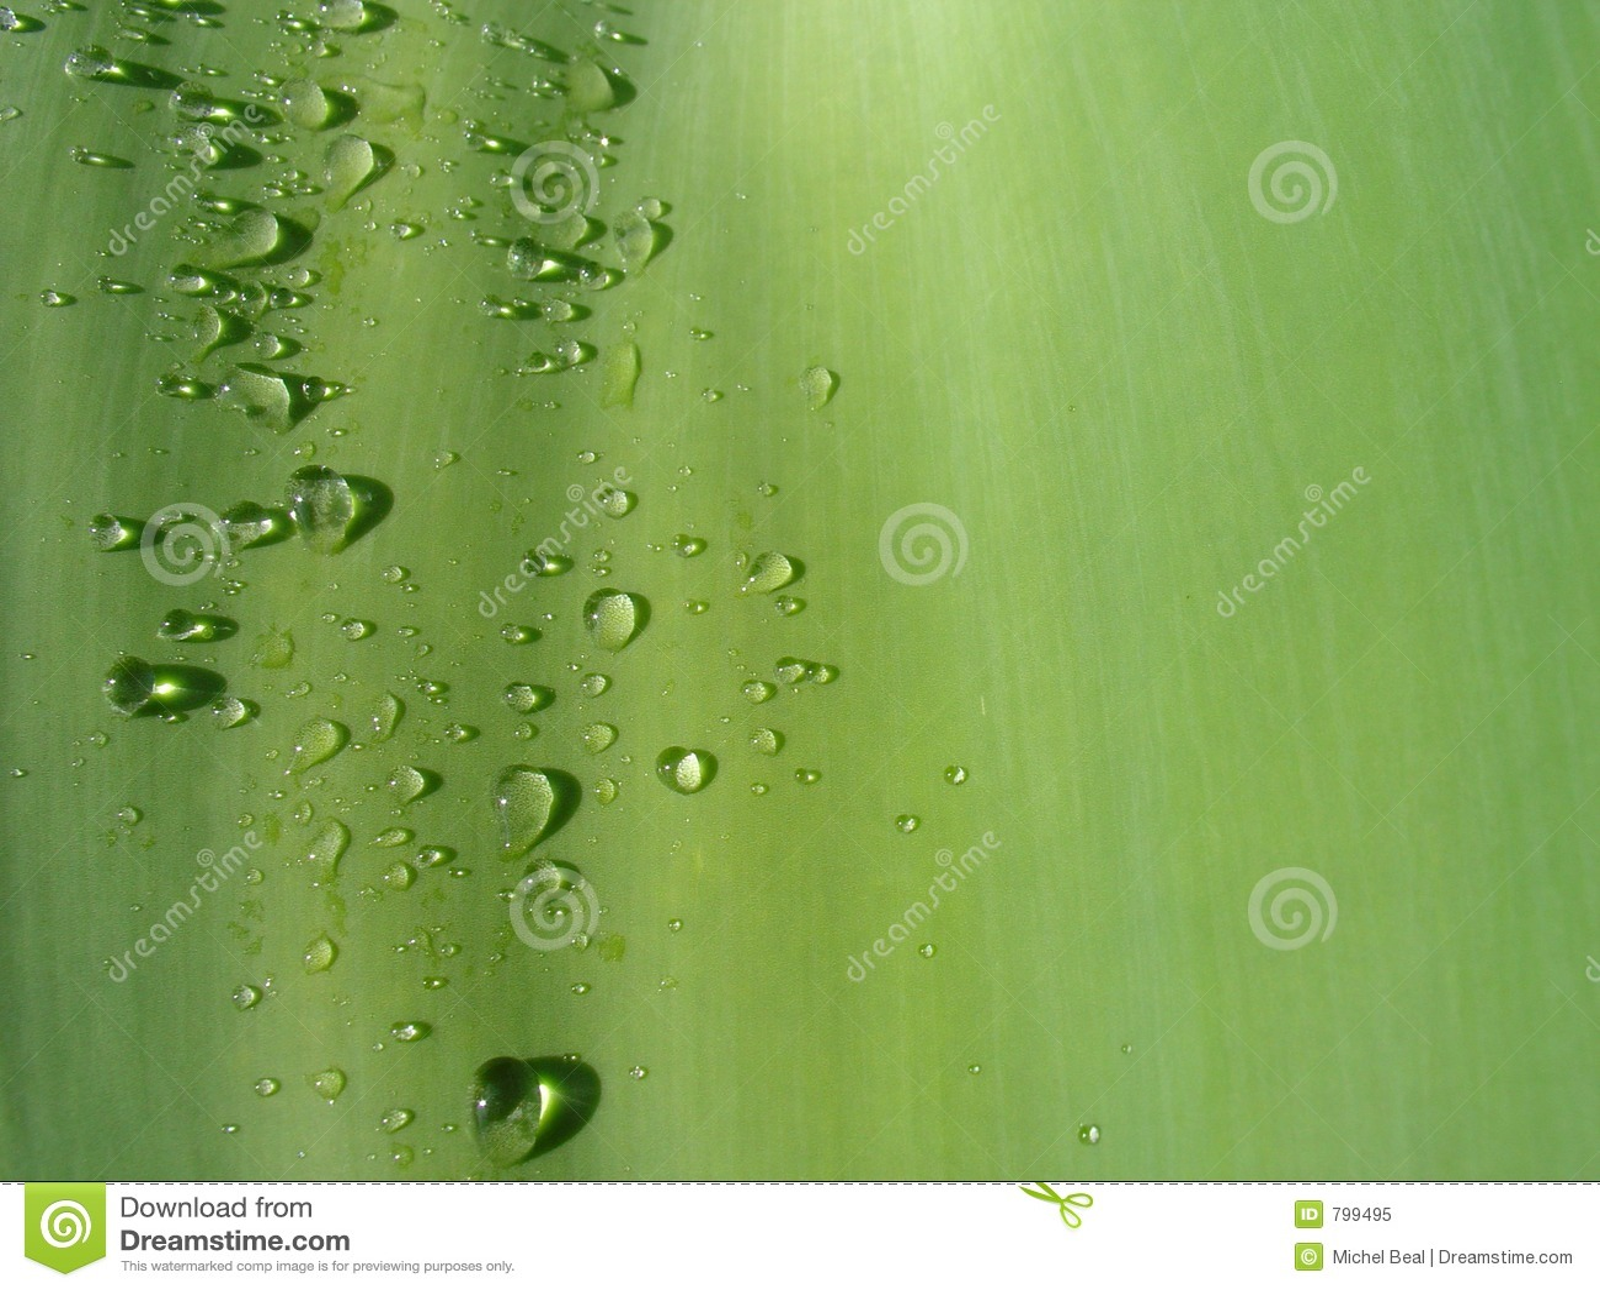 Waterdrop liści